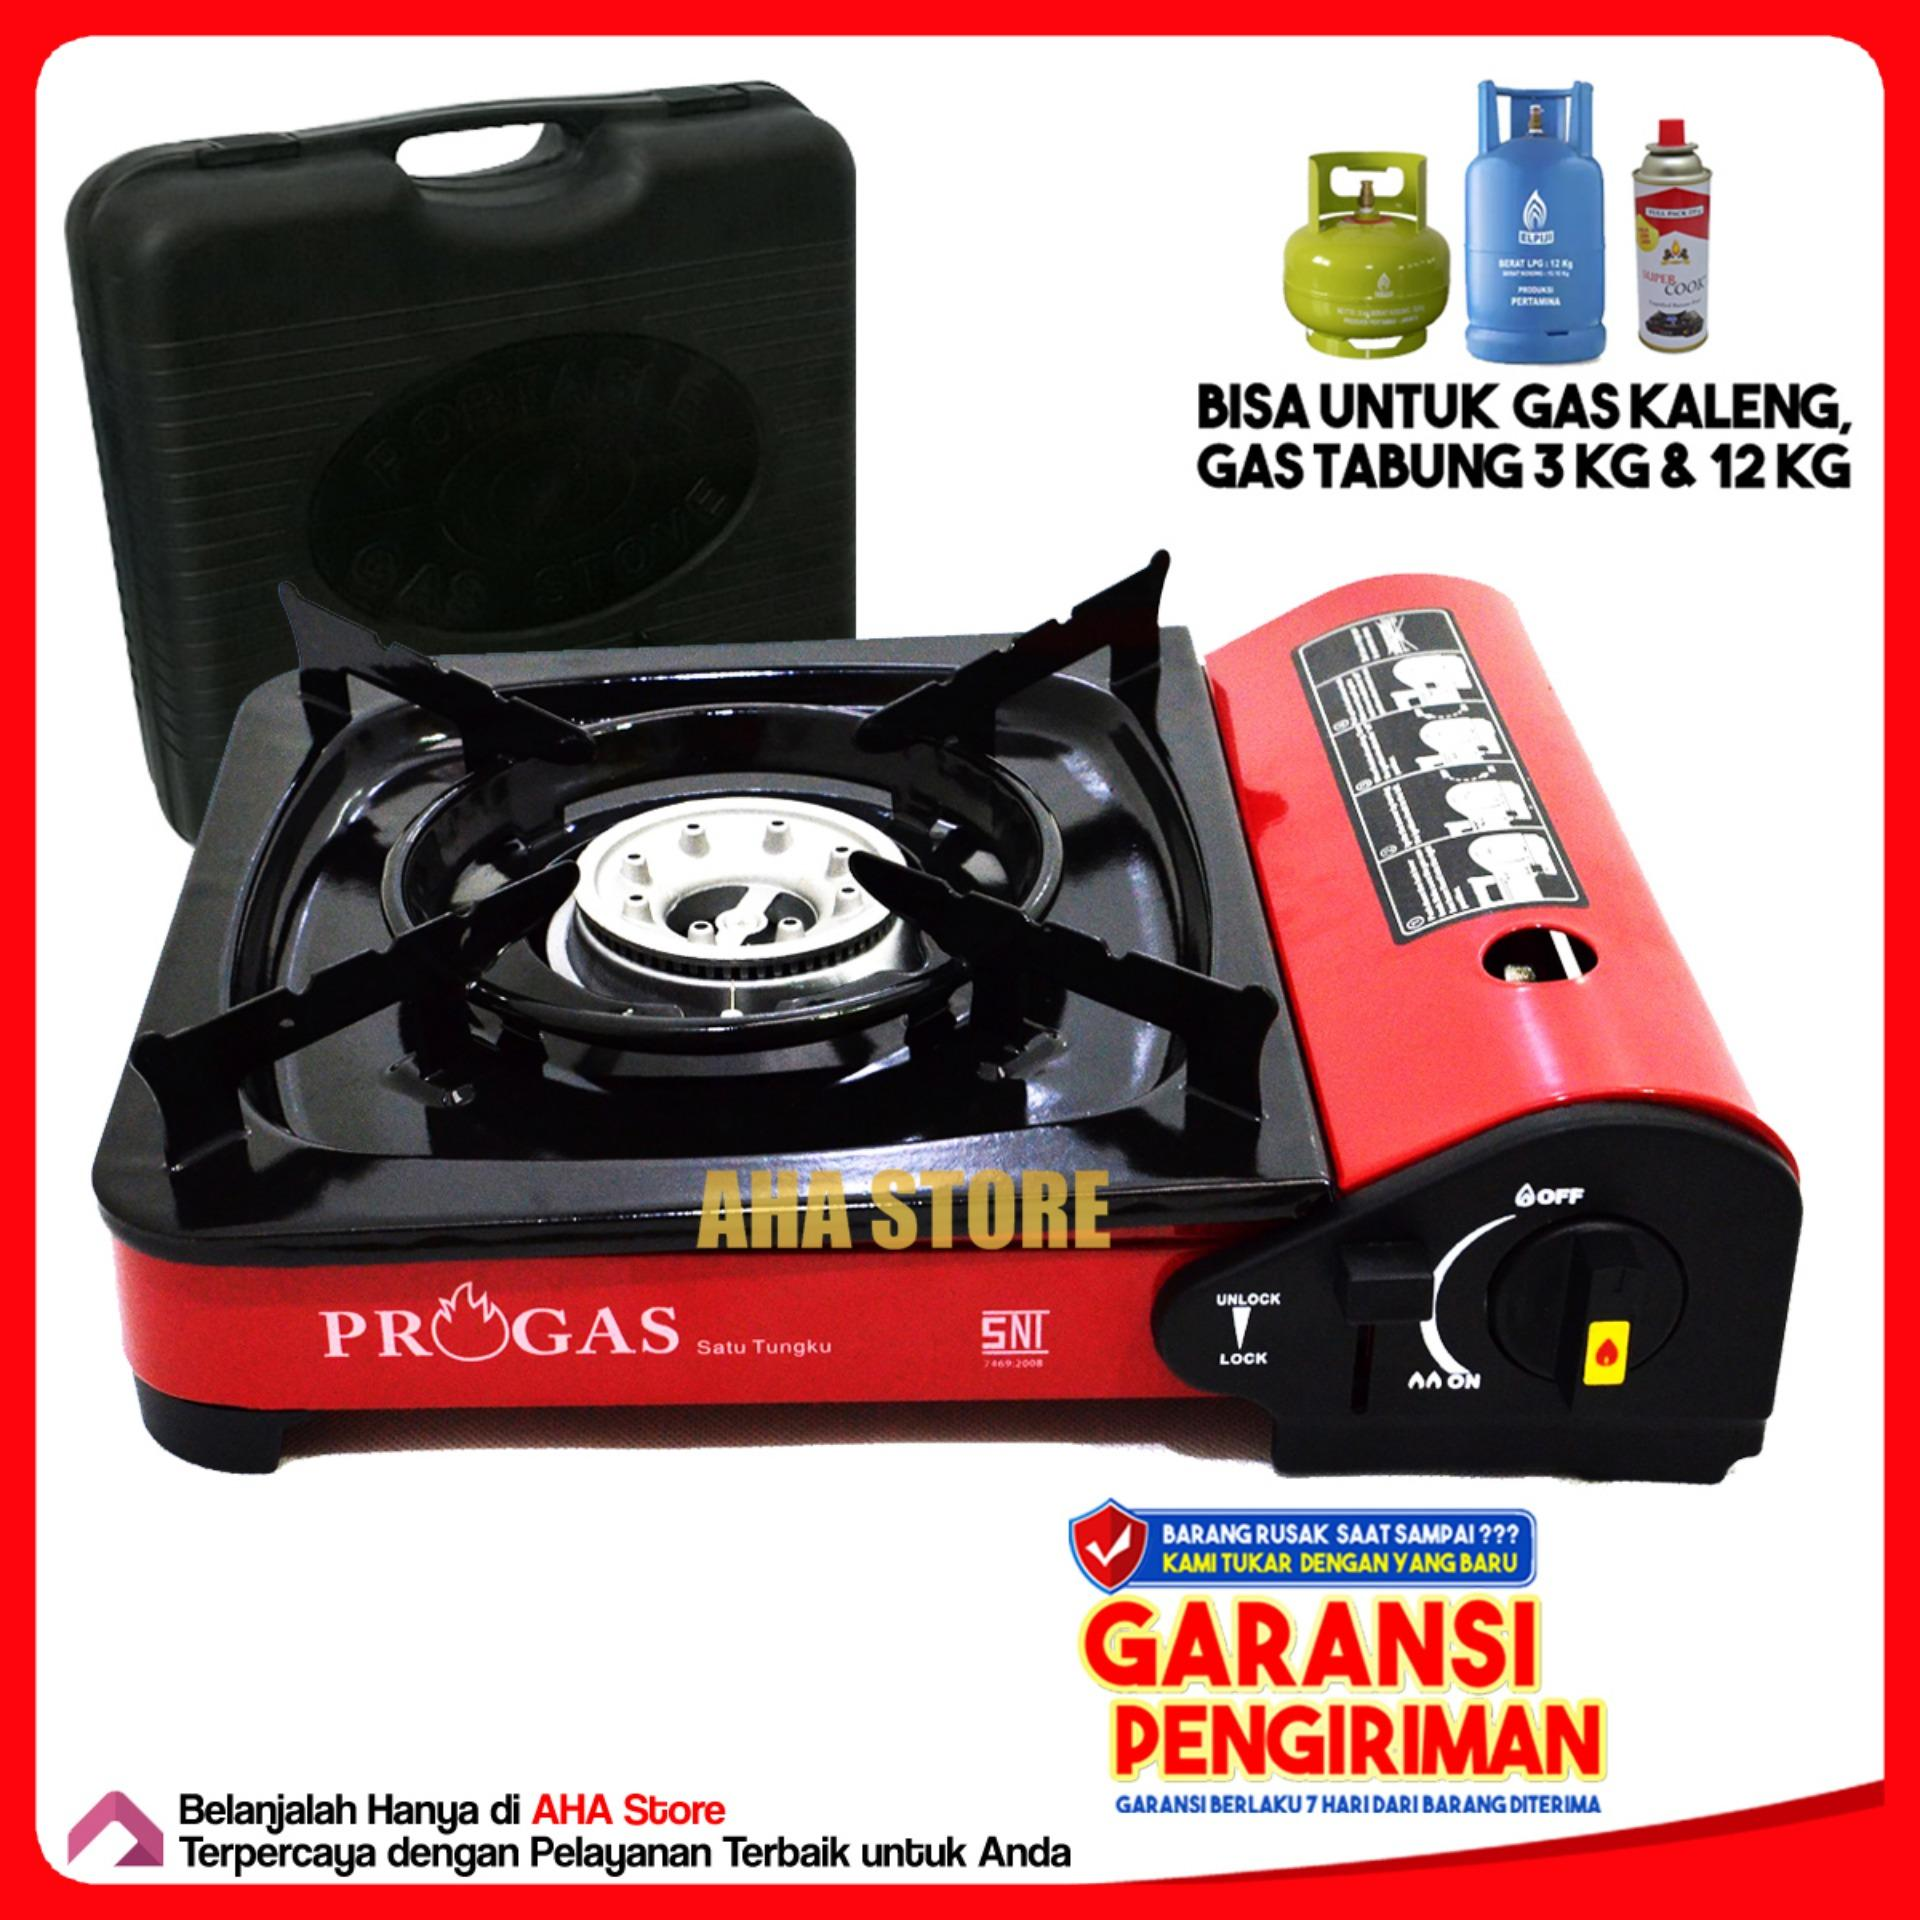 Progas Kompor Gas Portable 2 IN 1